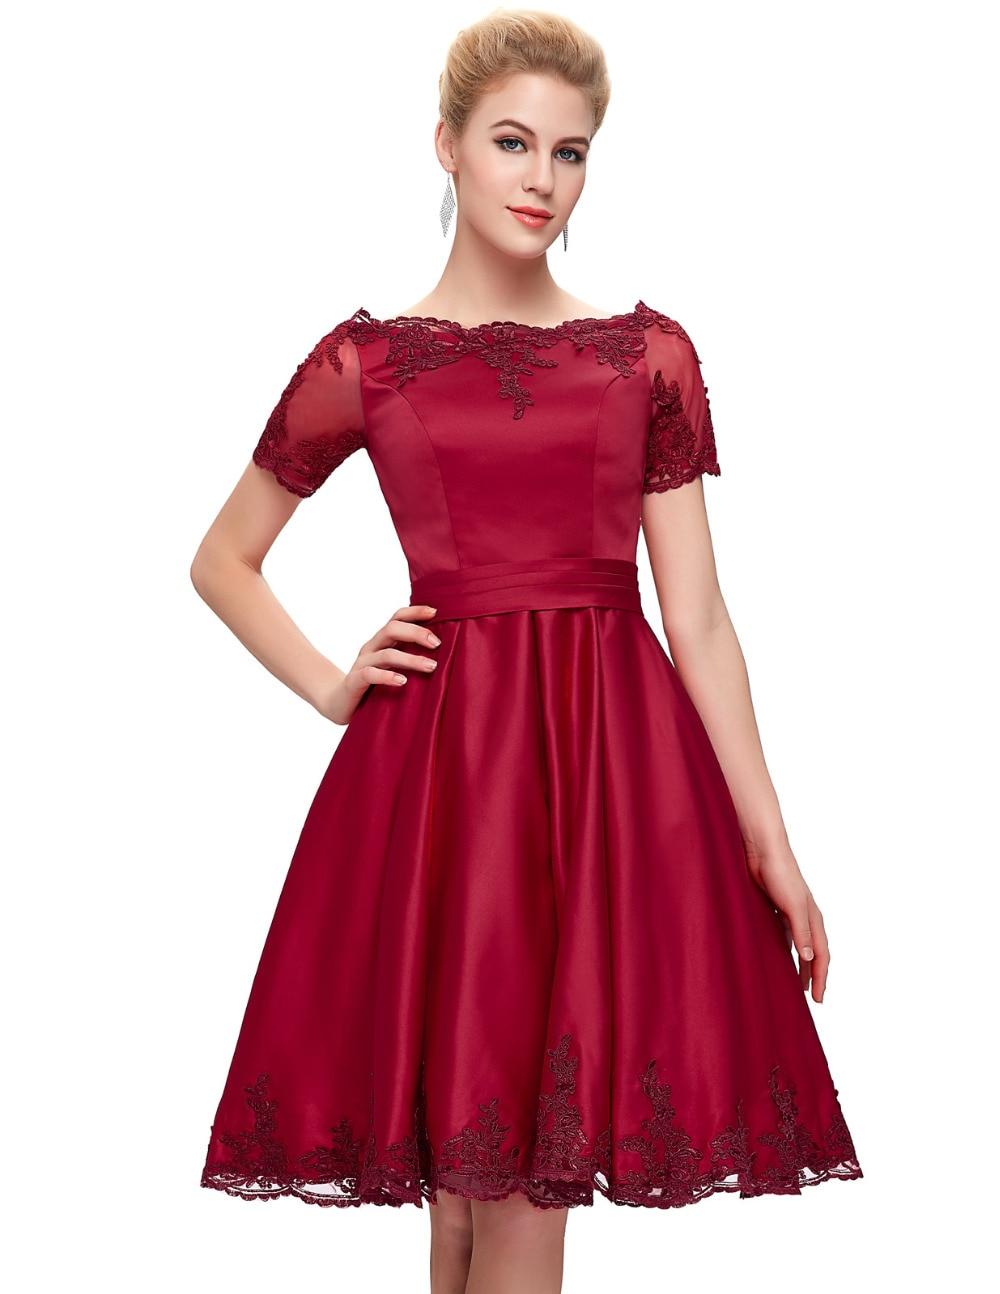 Sell Prom Dresses - Eligent Prom Dresses